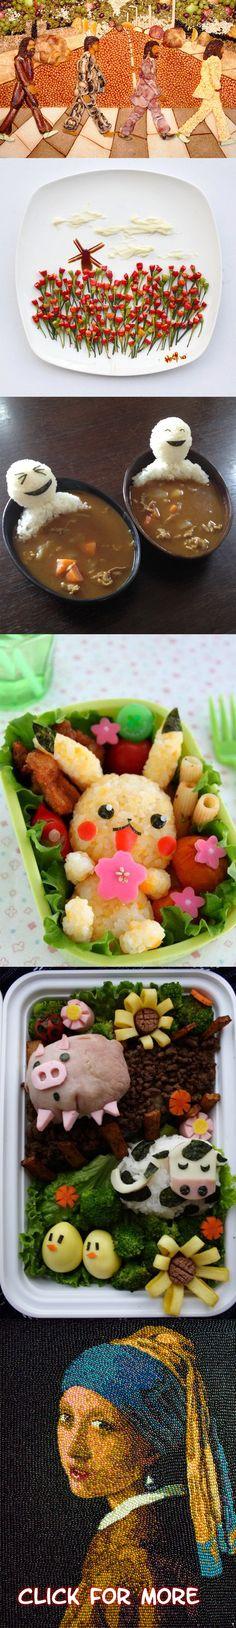 20 amazing food art creations!